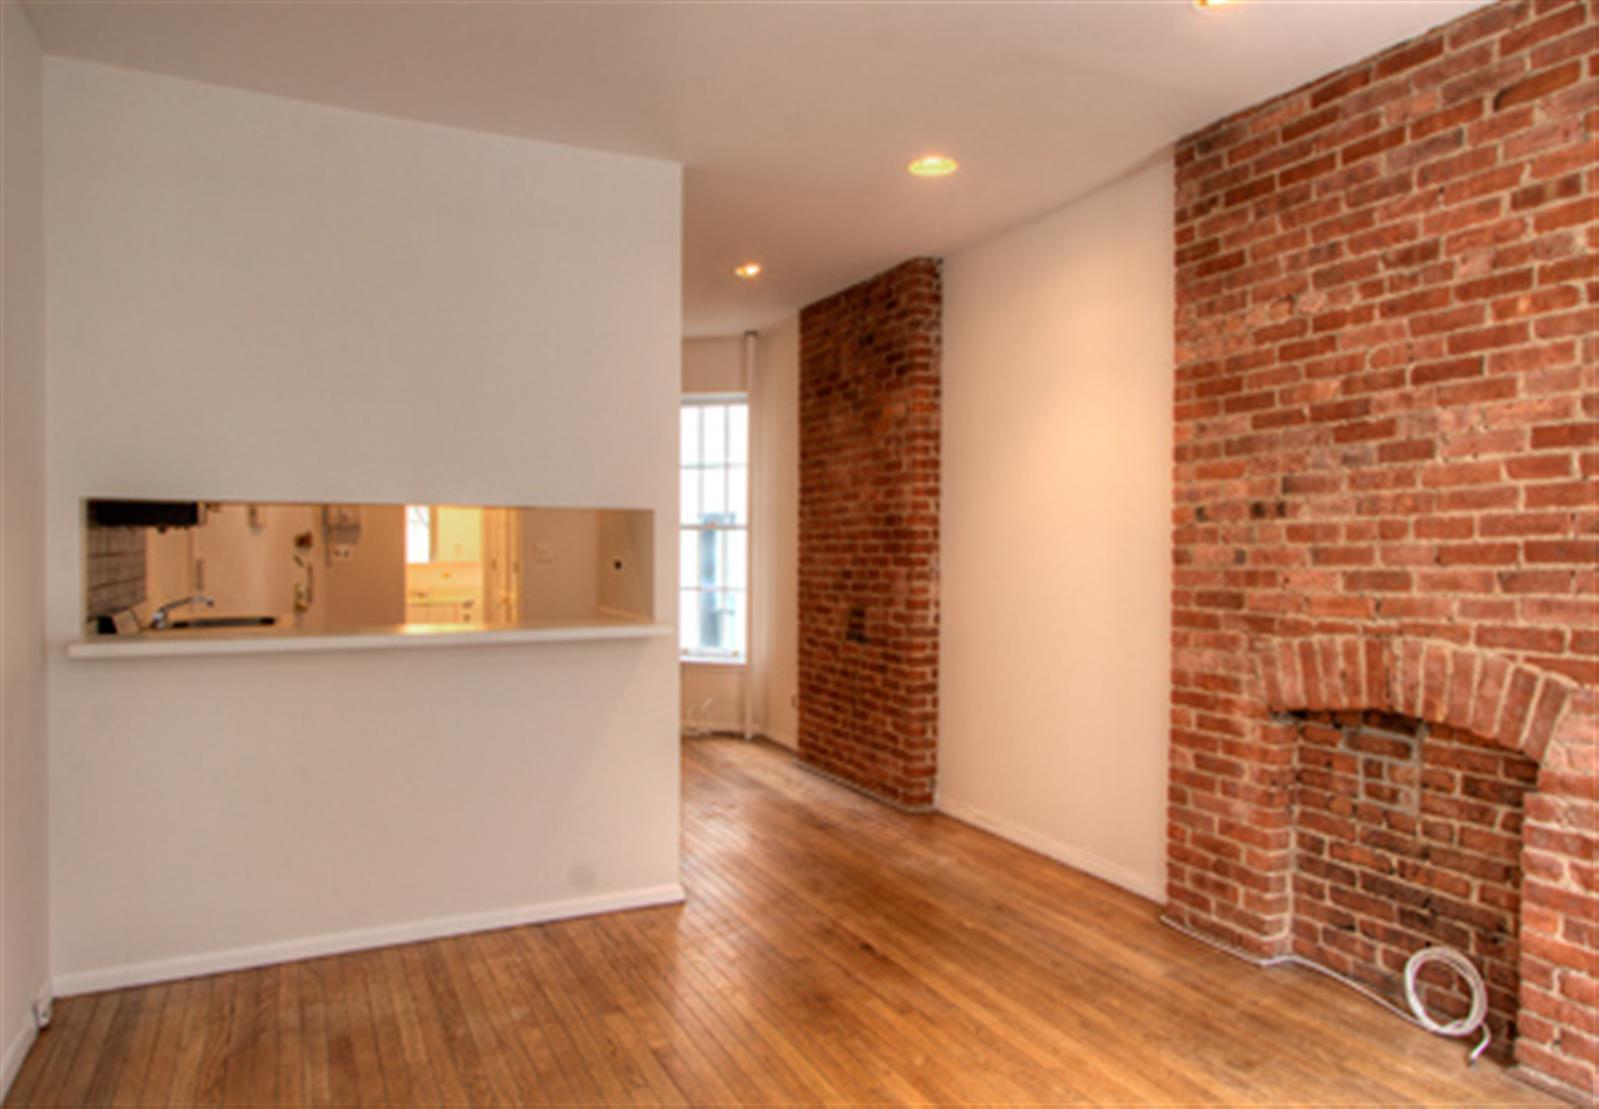 Studio - Upper East Side